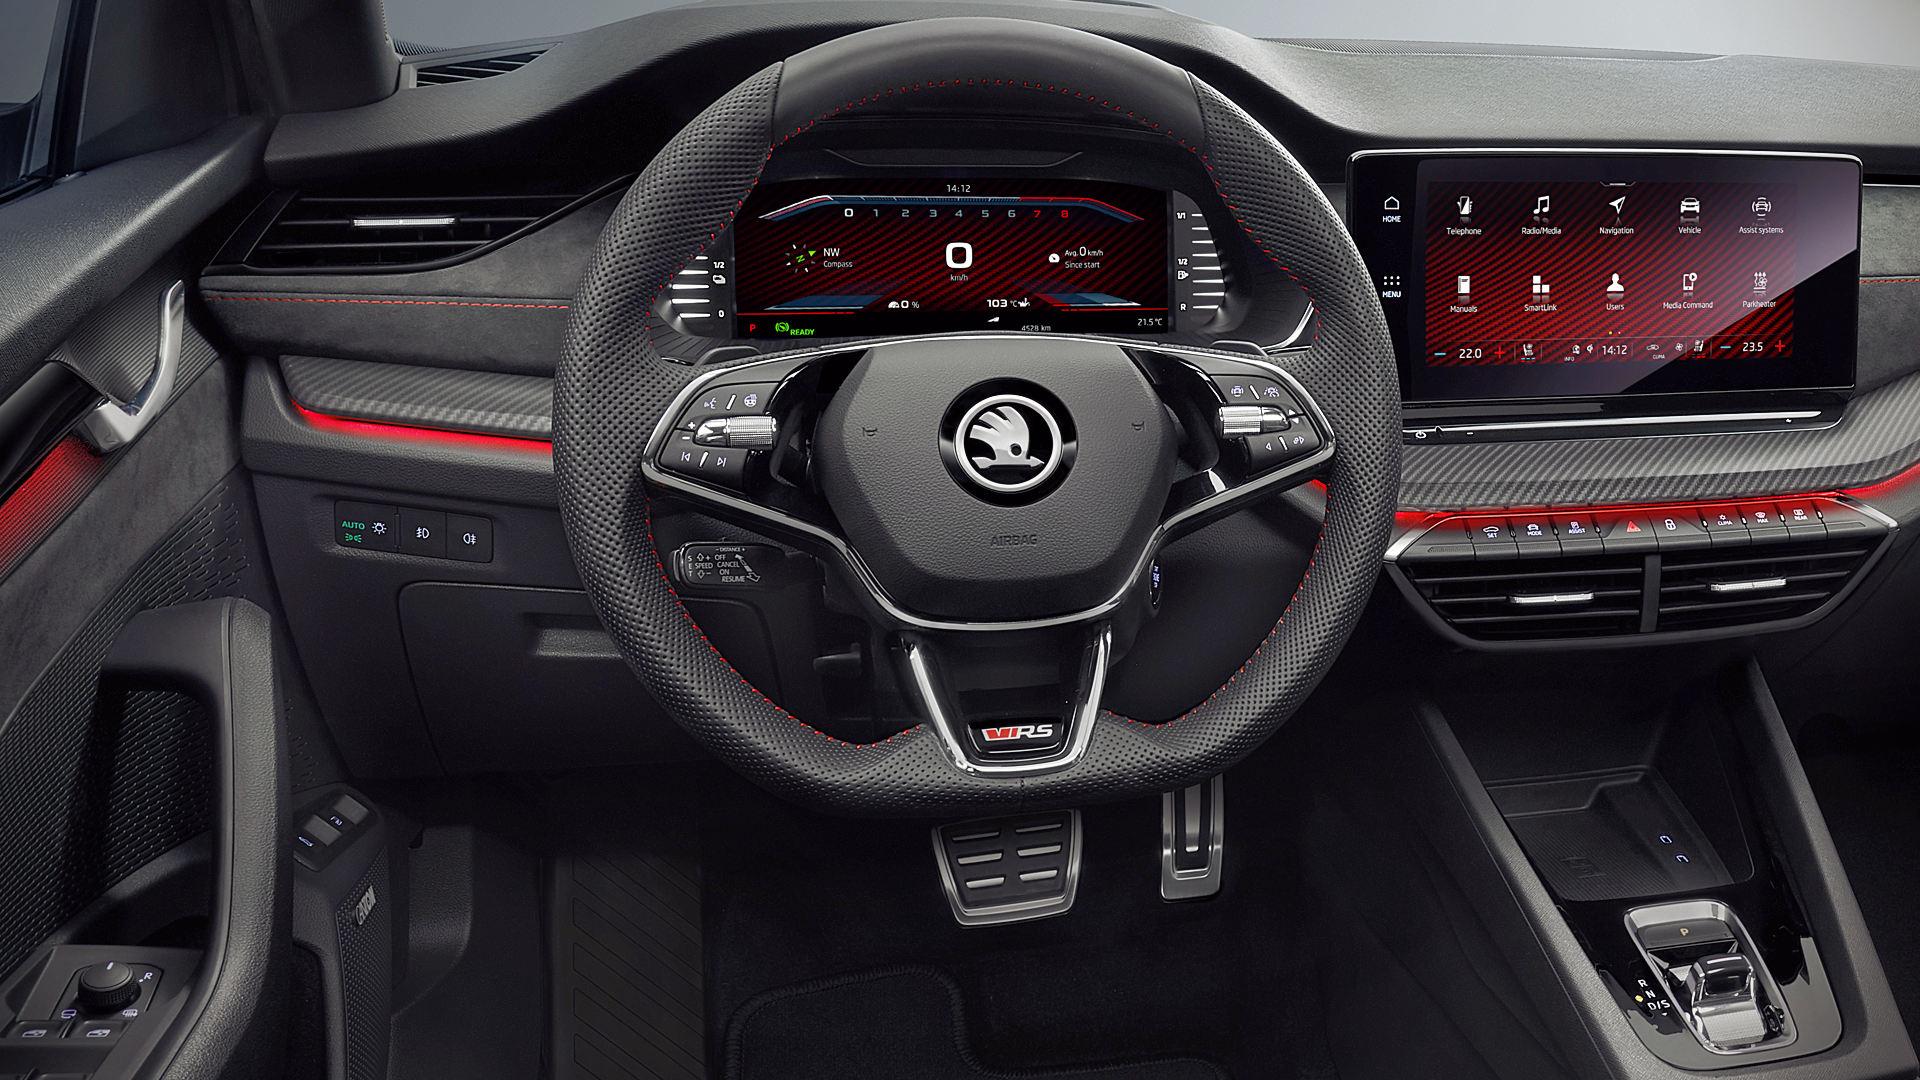 skoda-octavia-2020-rs-iv-interior